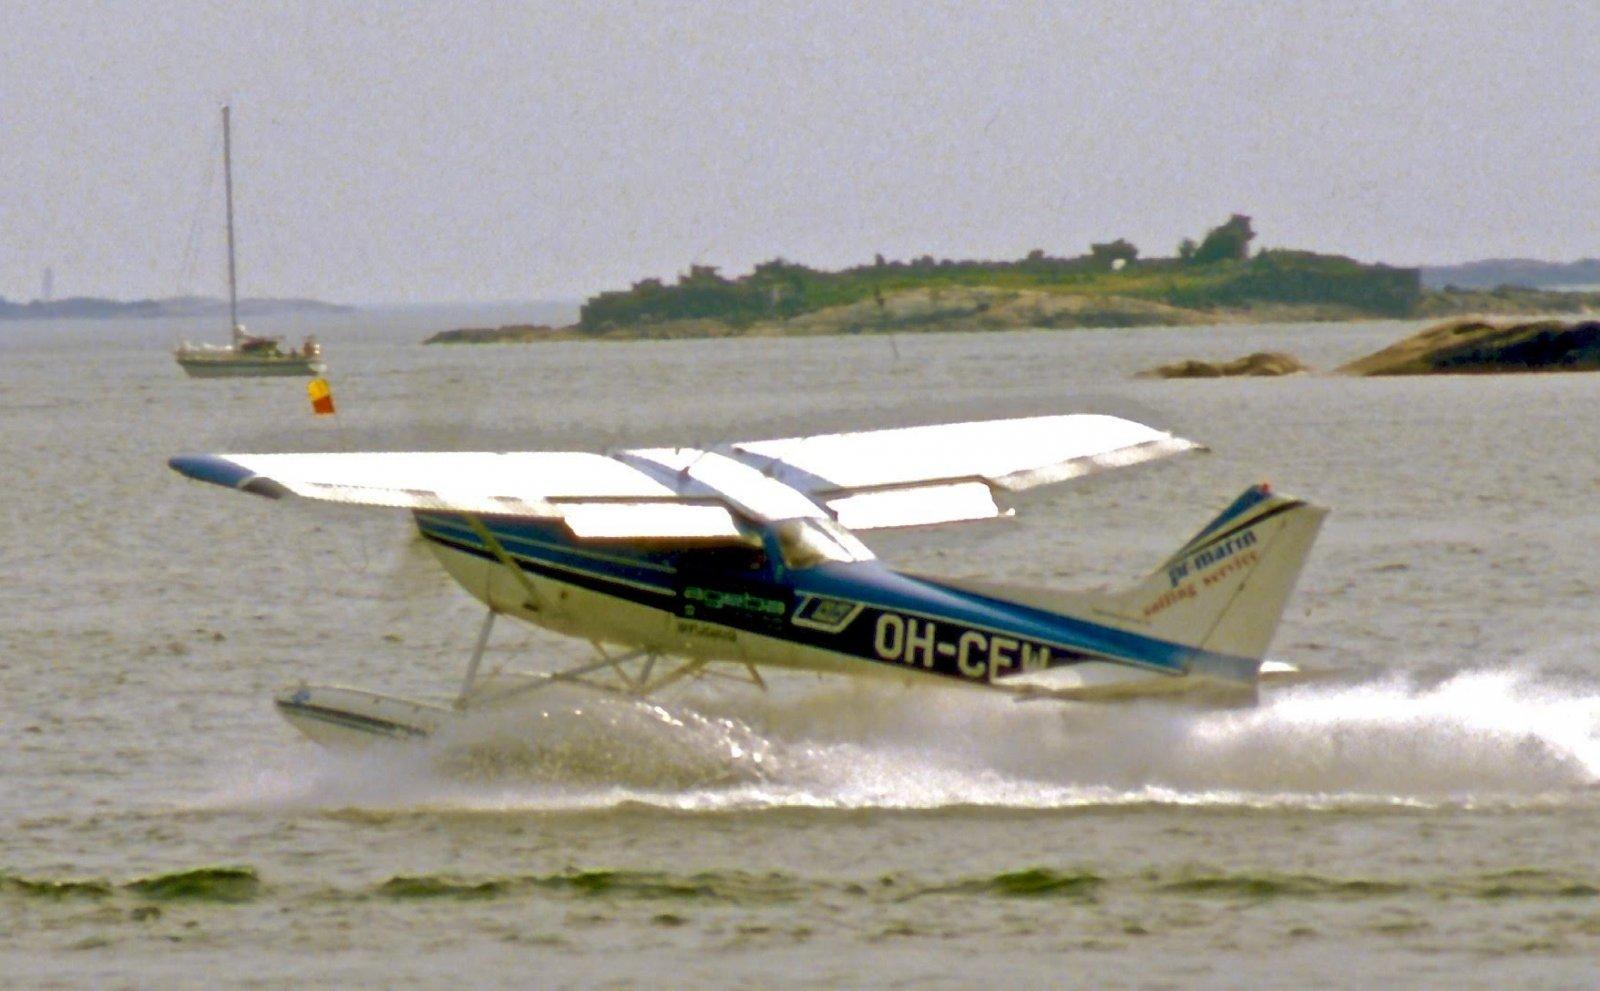 Reims/Cessna F172H OH-CFW Hanko 1983